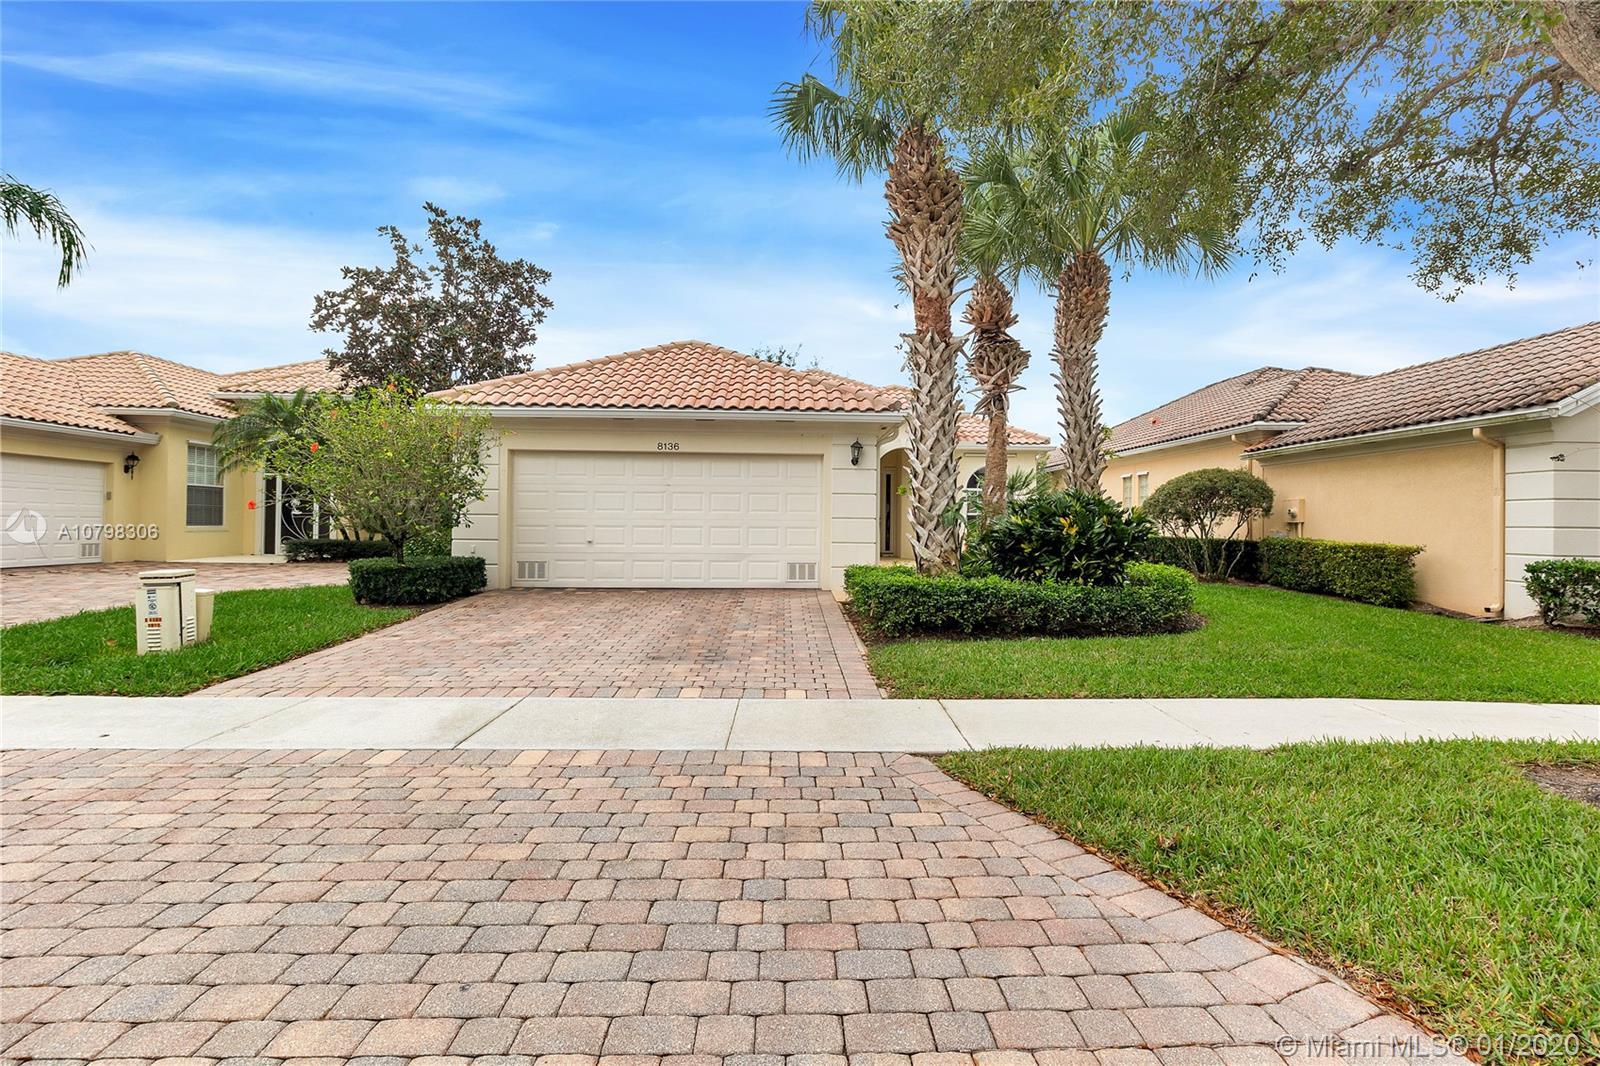 8136 Laborie Ln, Wellington, FL 33414 - Wellington, FL real estate listing